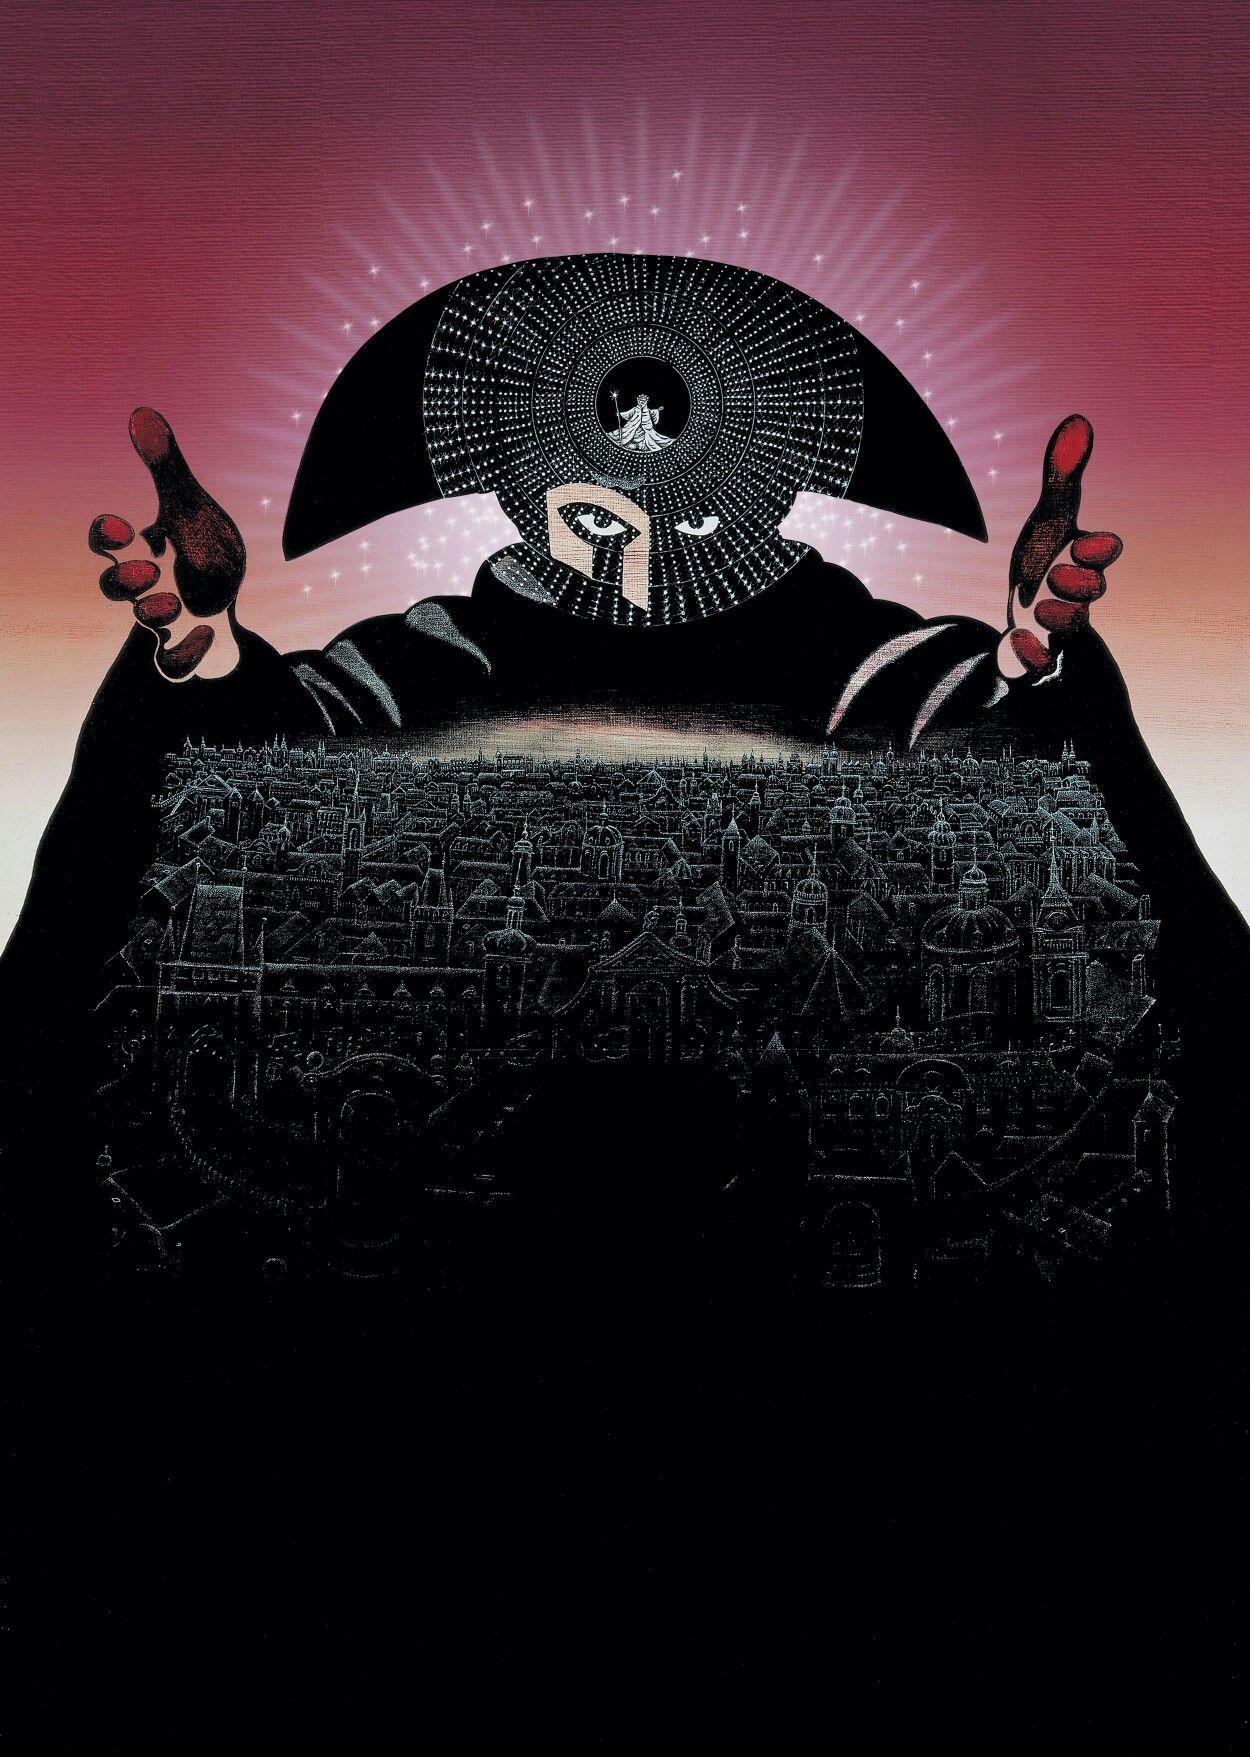 Amadeus 4 Poster Greatest Movies Classic /& Vintage Films